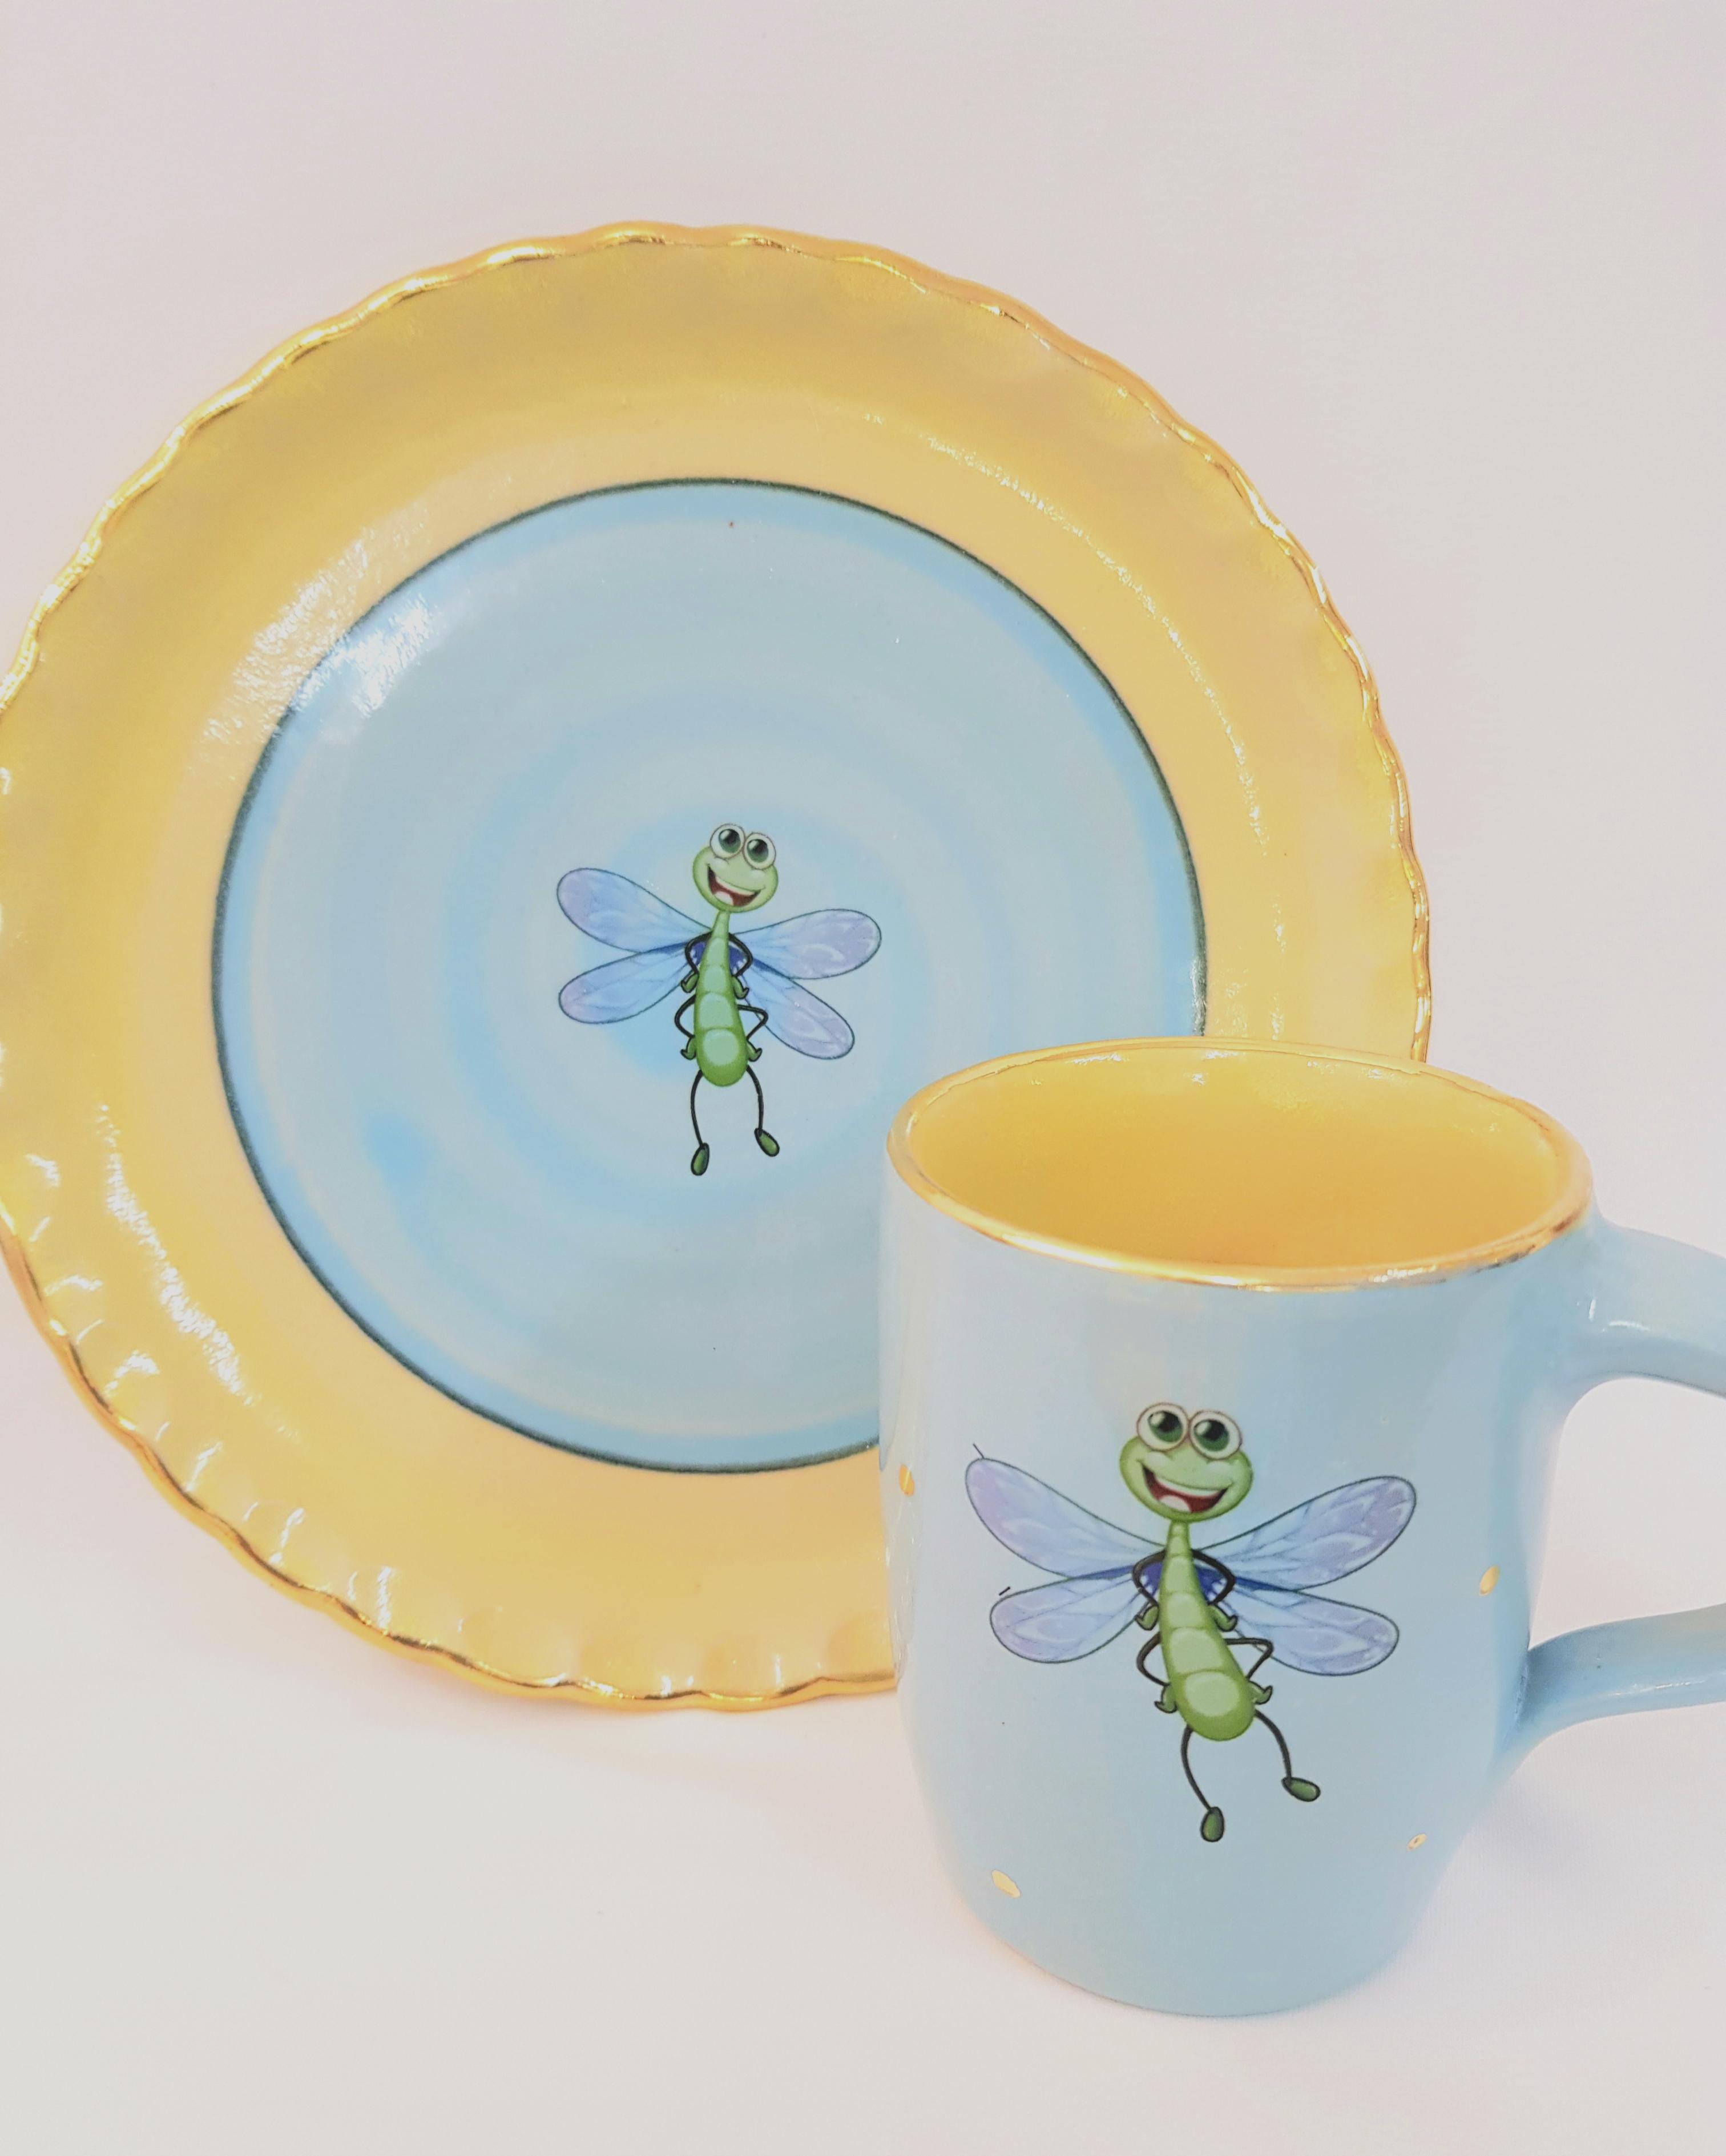 Kindergeschirr, Keramik, Töpferei la ceramica Basel, online shop, Kurse